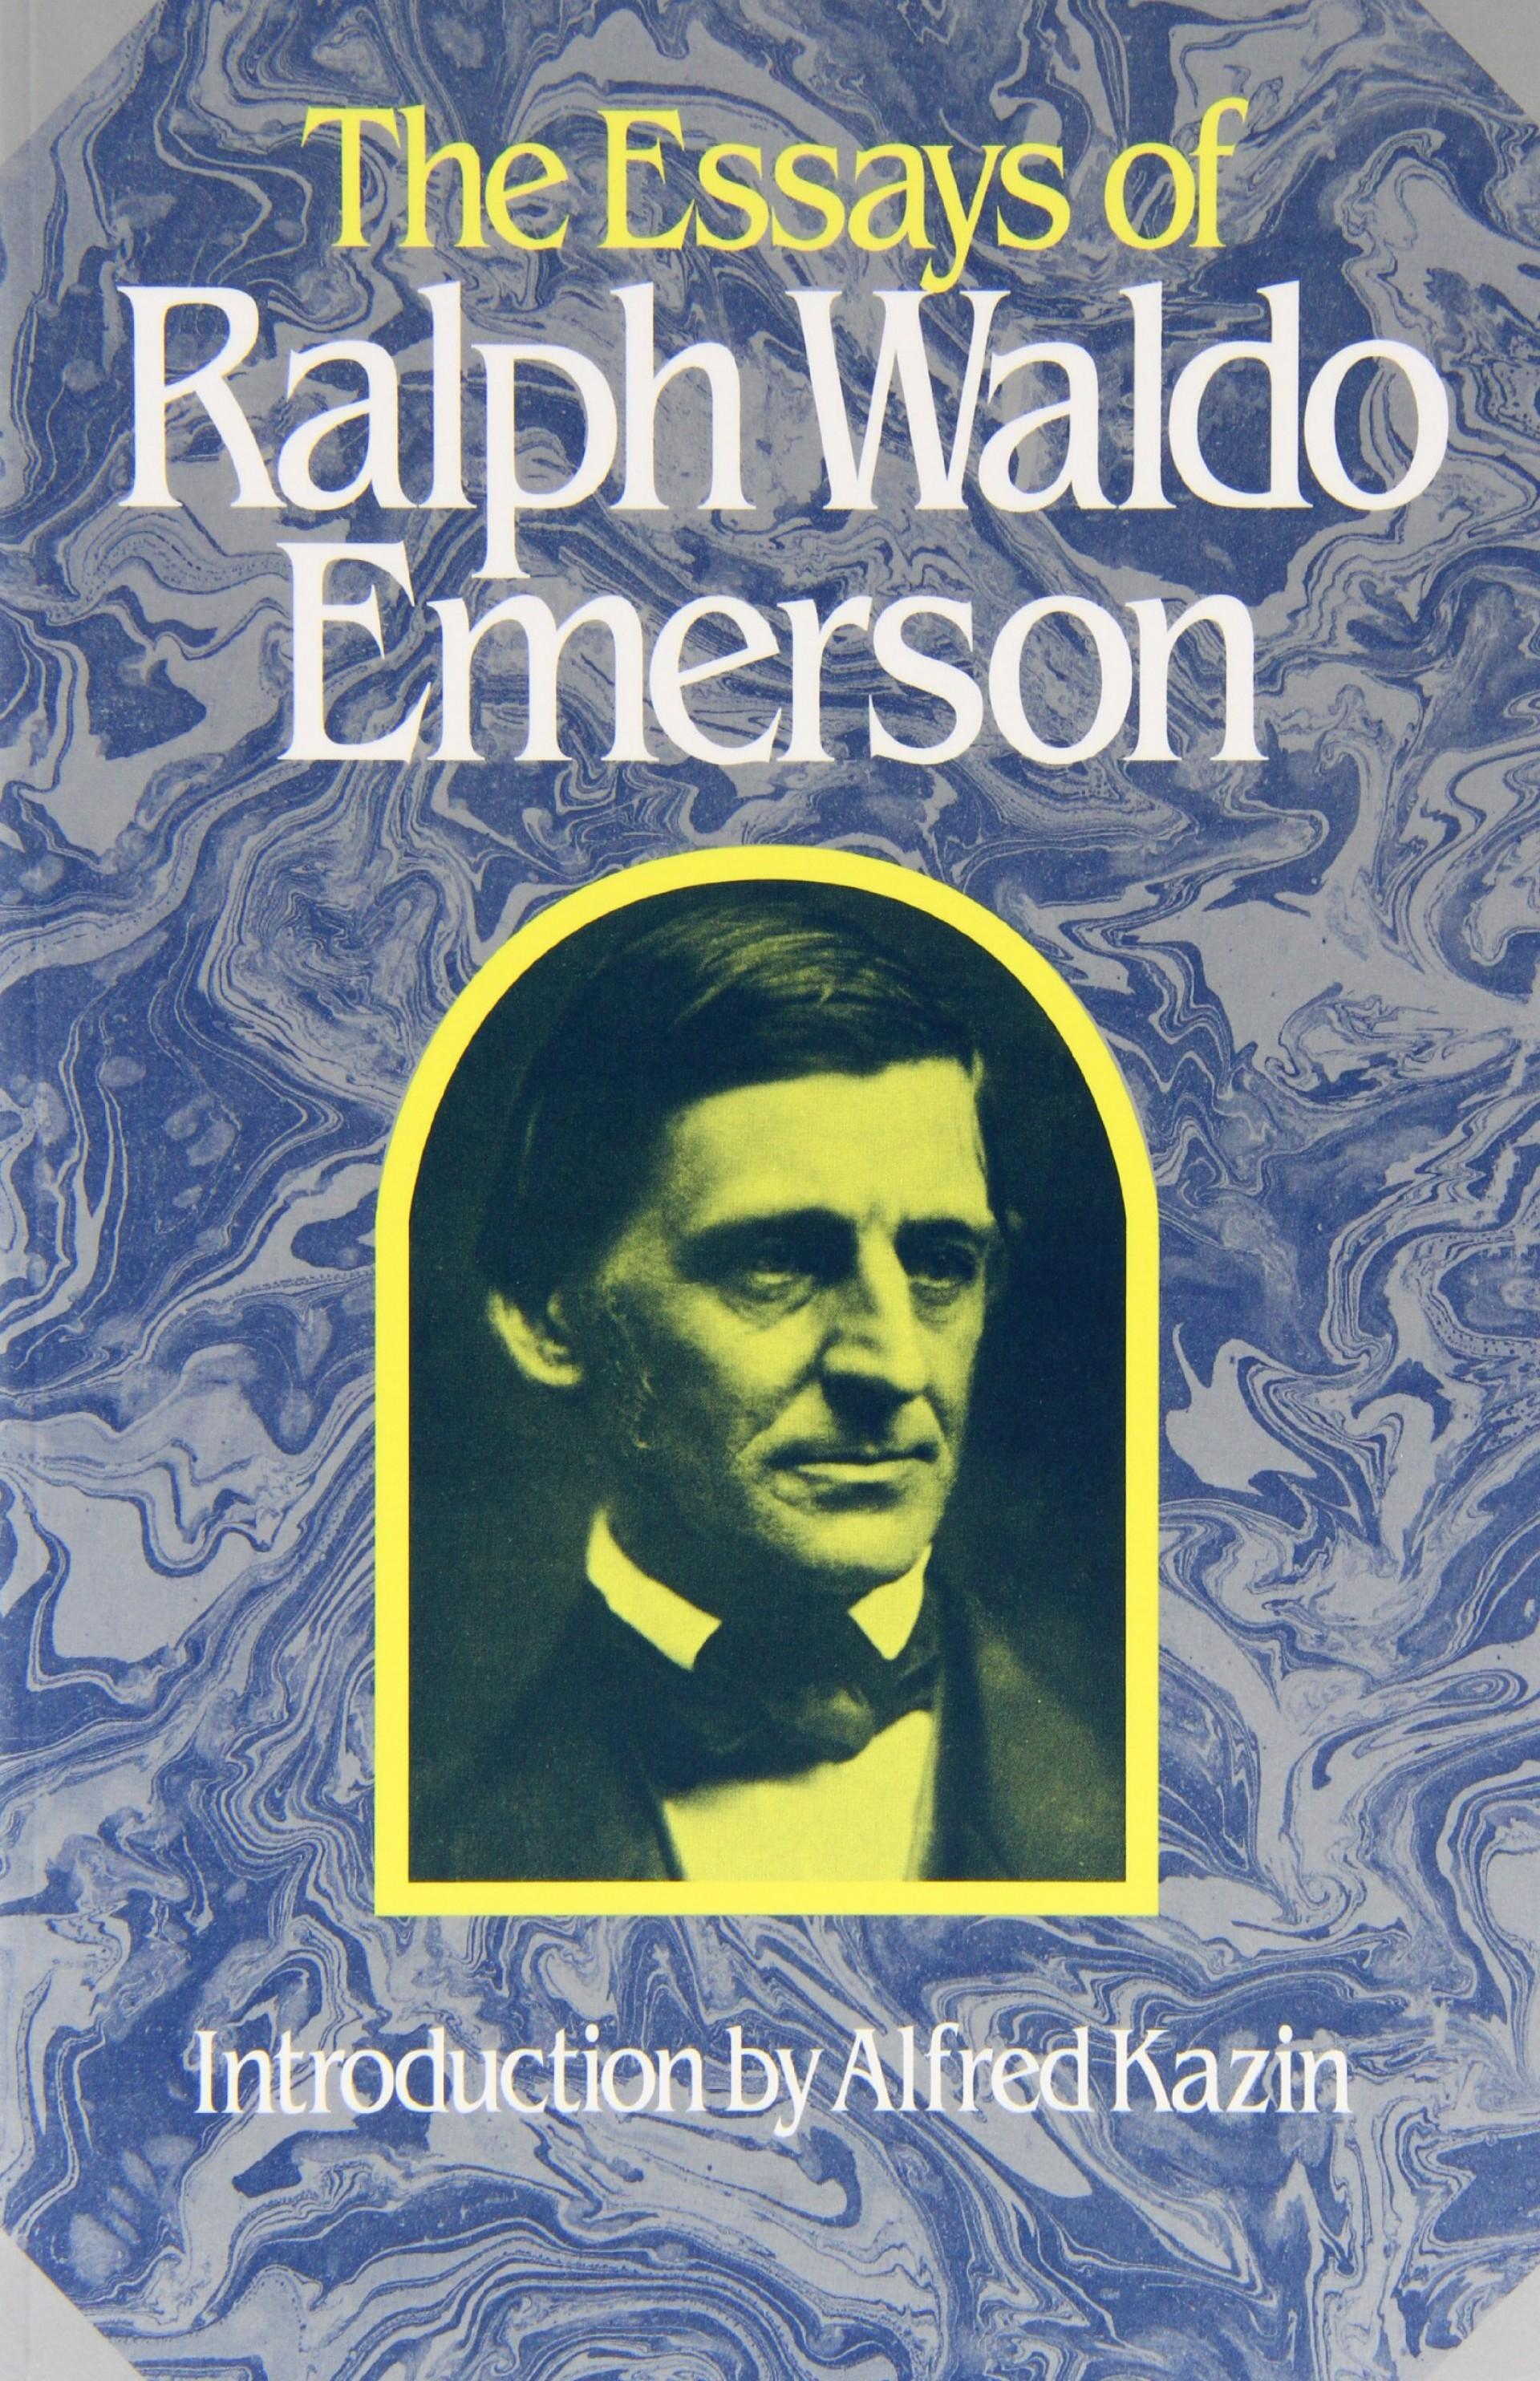 021 Essay Example 91blpvu4wrl Self Reliance And Other Formidable Essays Ralph Waldo Emerson Pdf Ekşi 1920